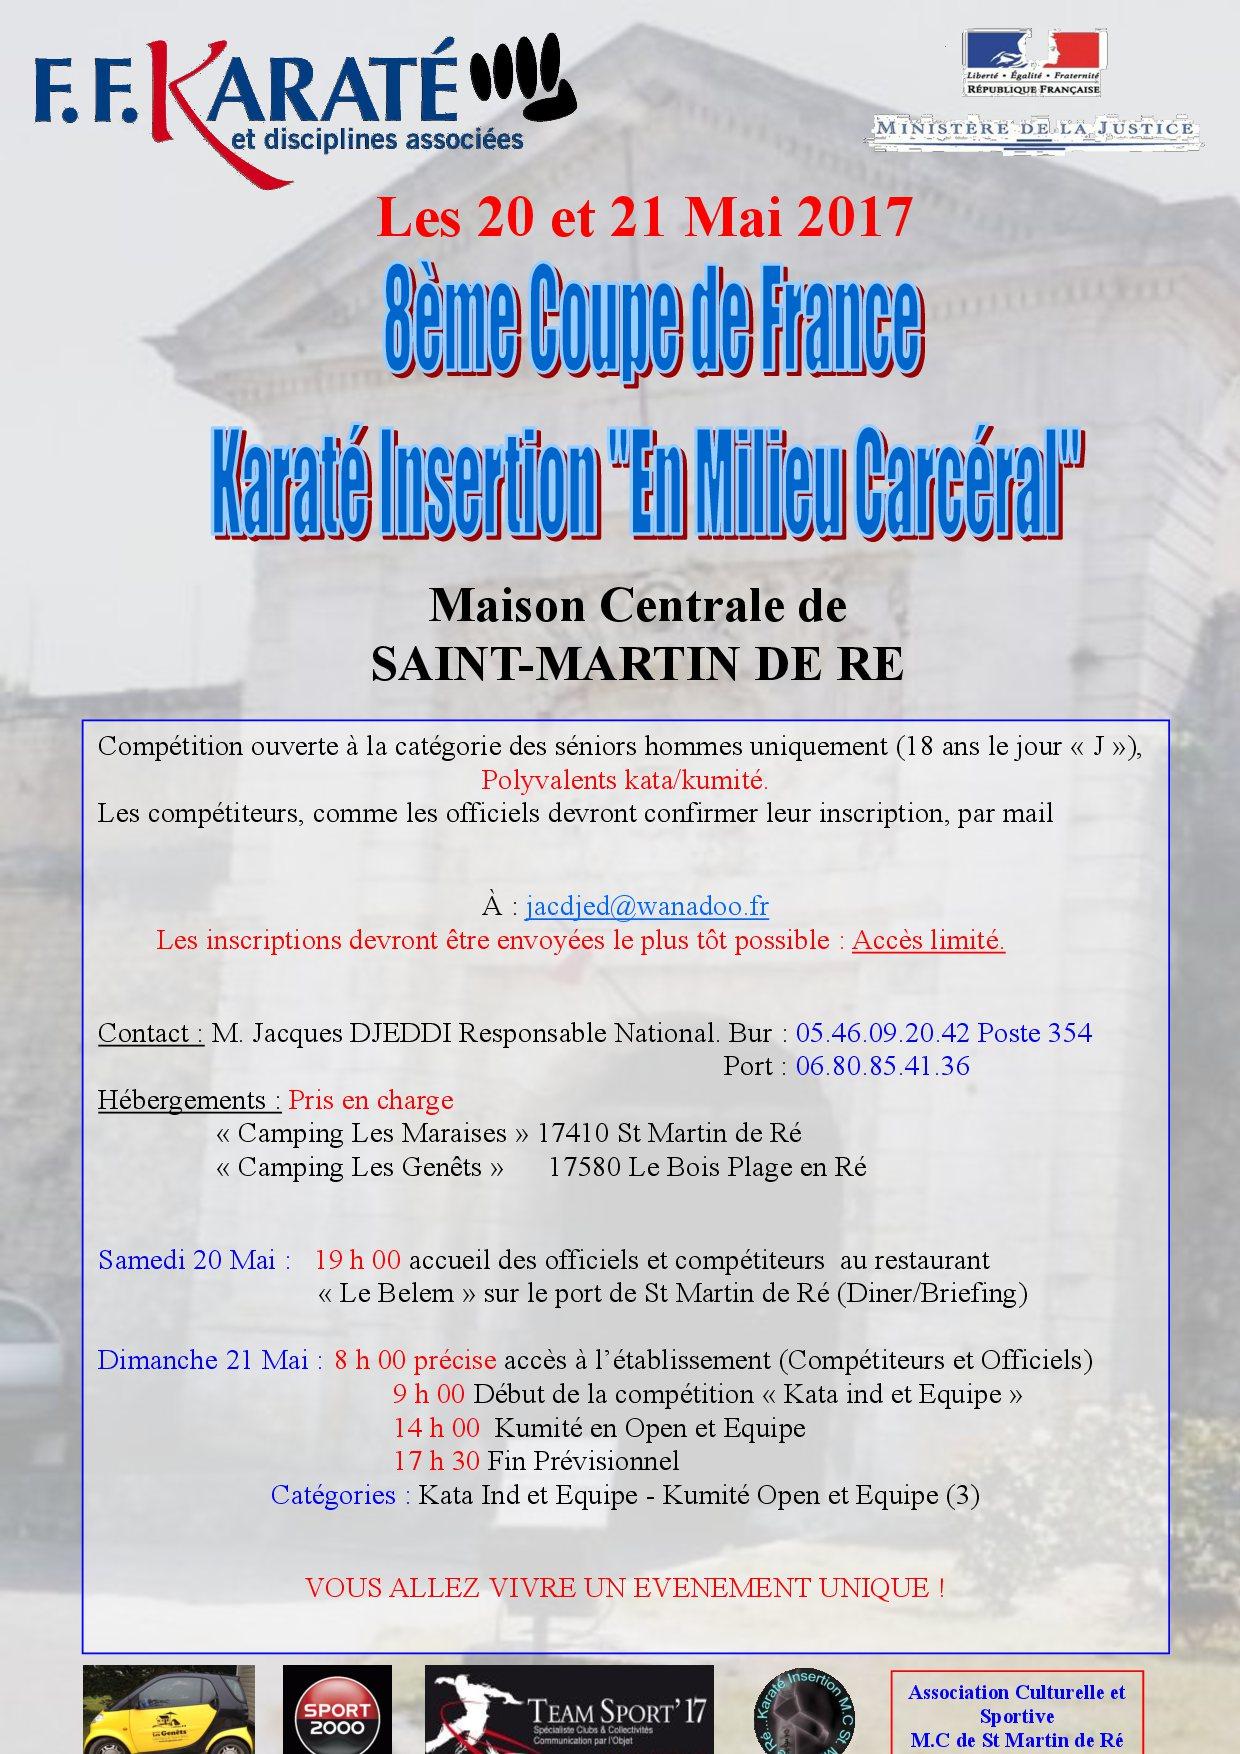 Affiche 8eme coupe de france karate insertion